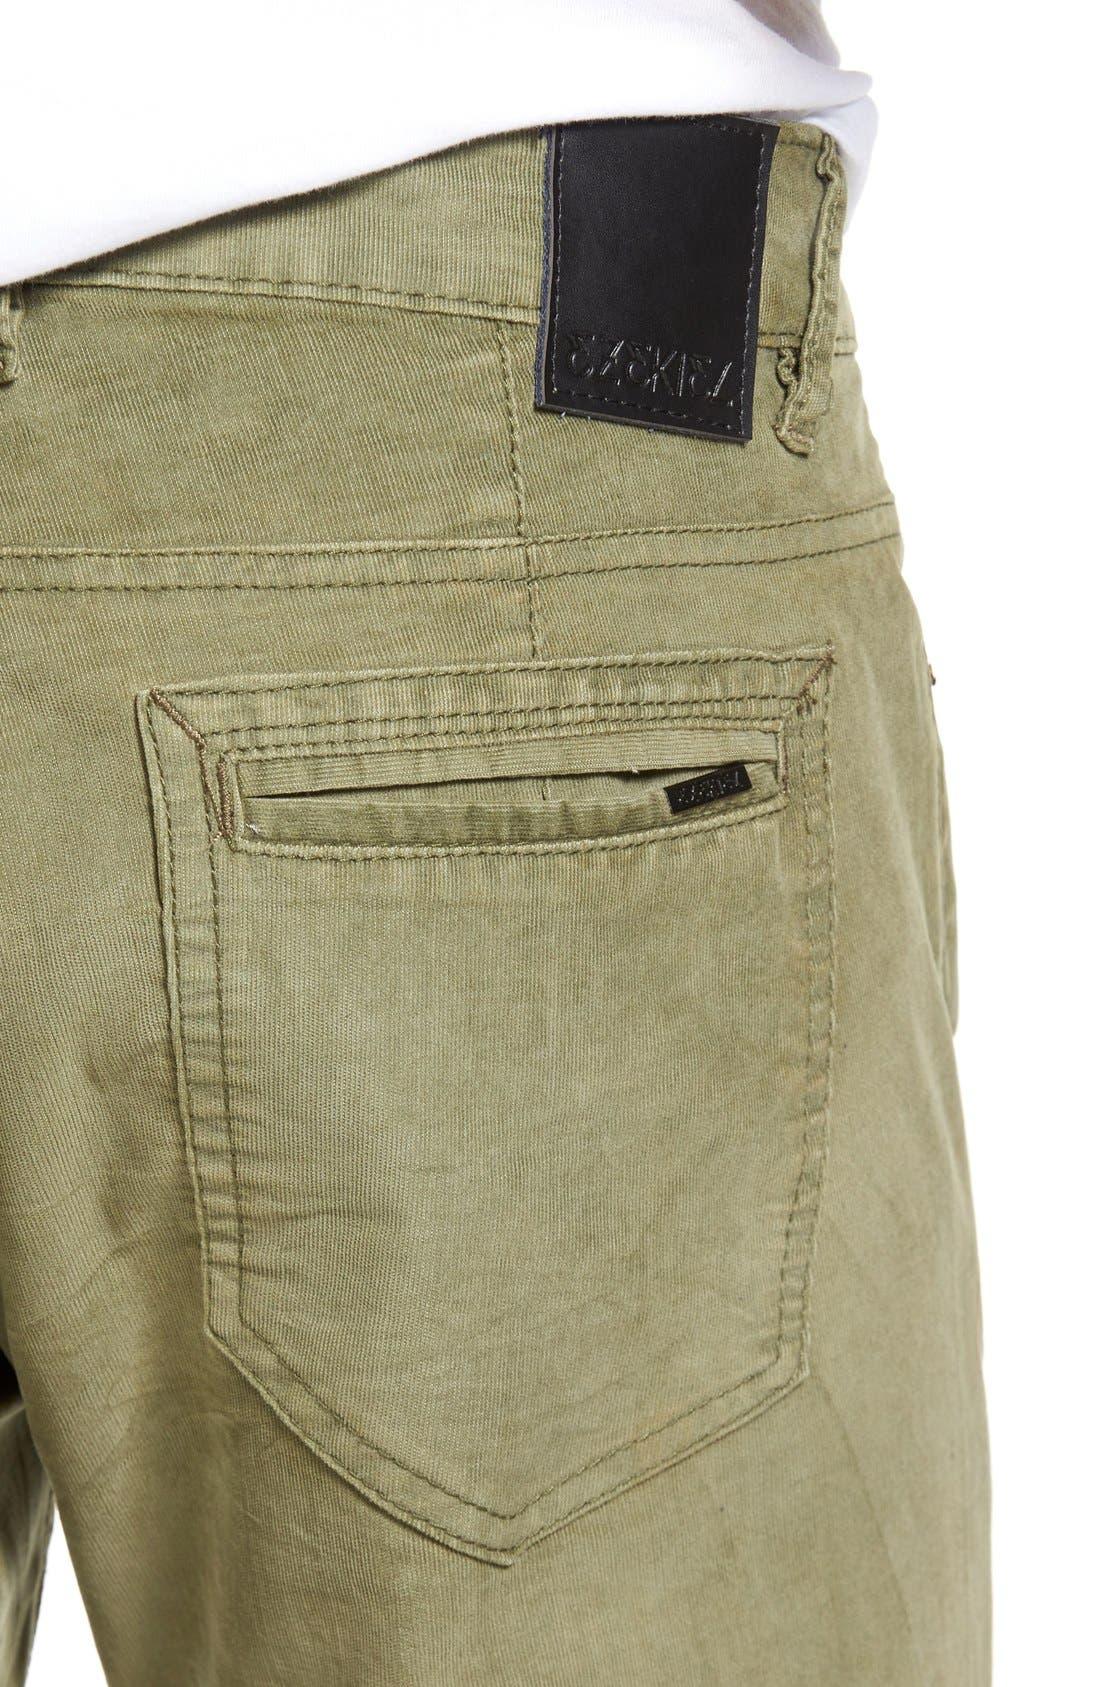 Bryce Chopper Slim Fit Corduroy Pants,                             Alternate thumbnail 4, color,                             Olive